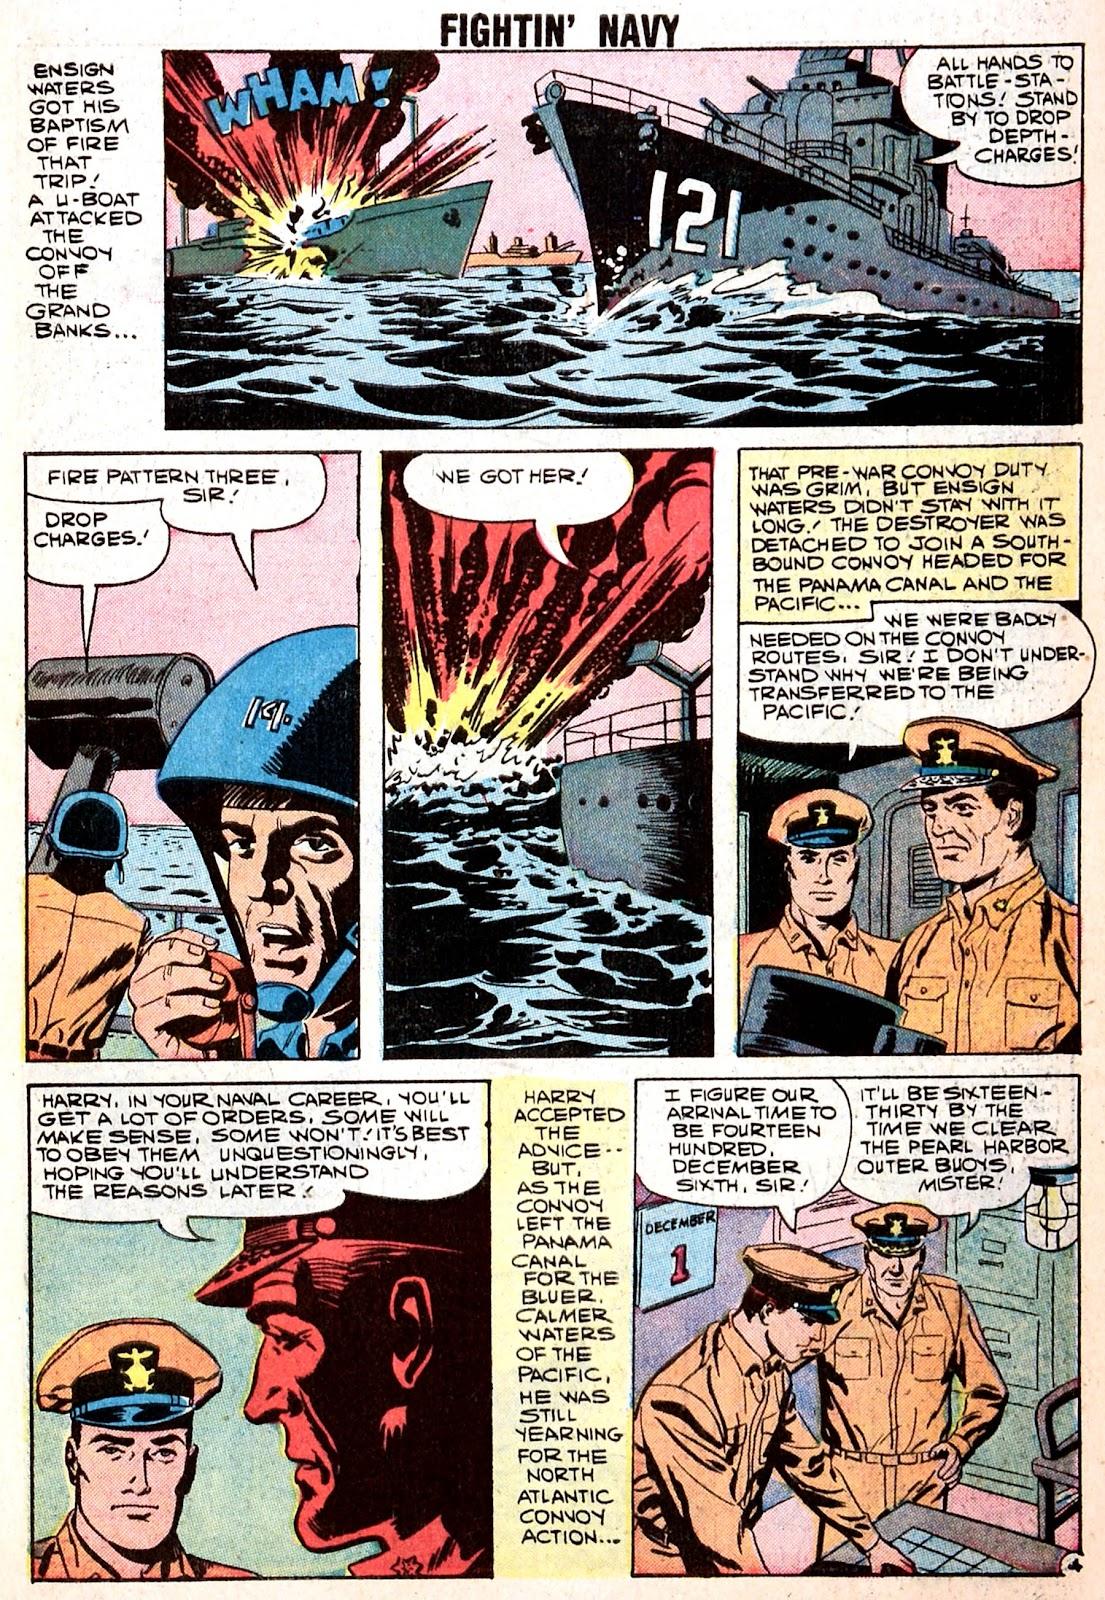 Read online Fightin' Navy comic -  Issue #85 - 7